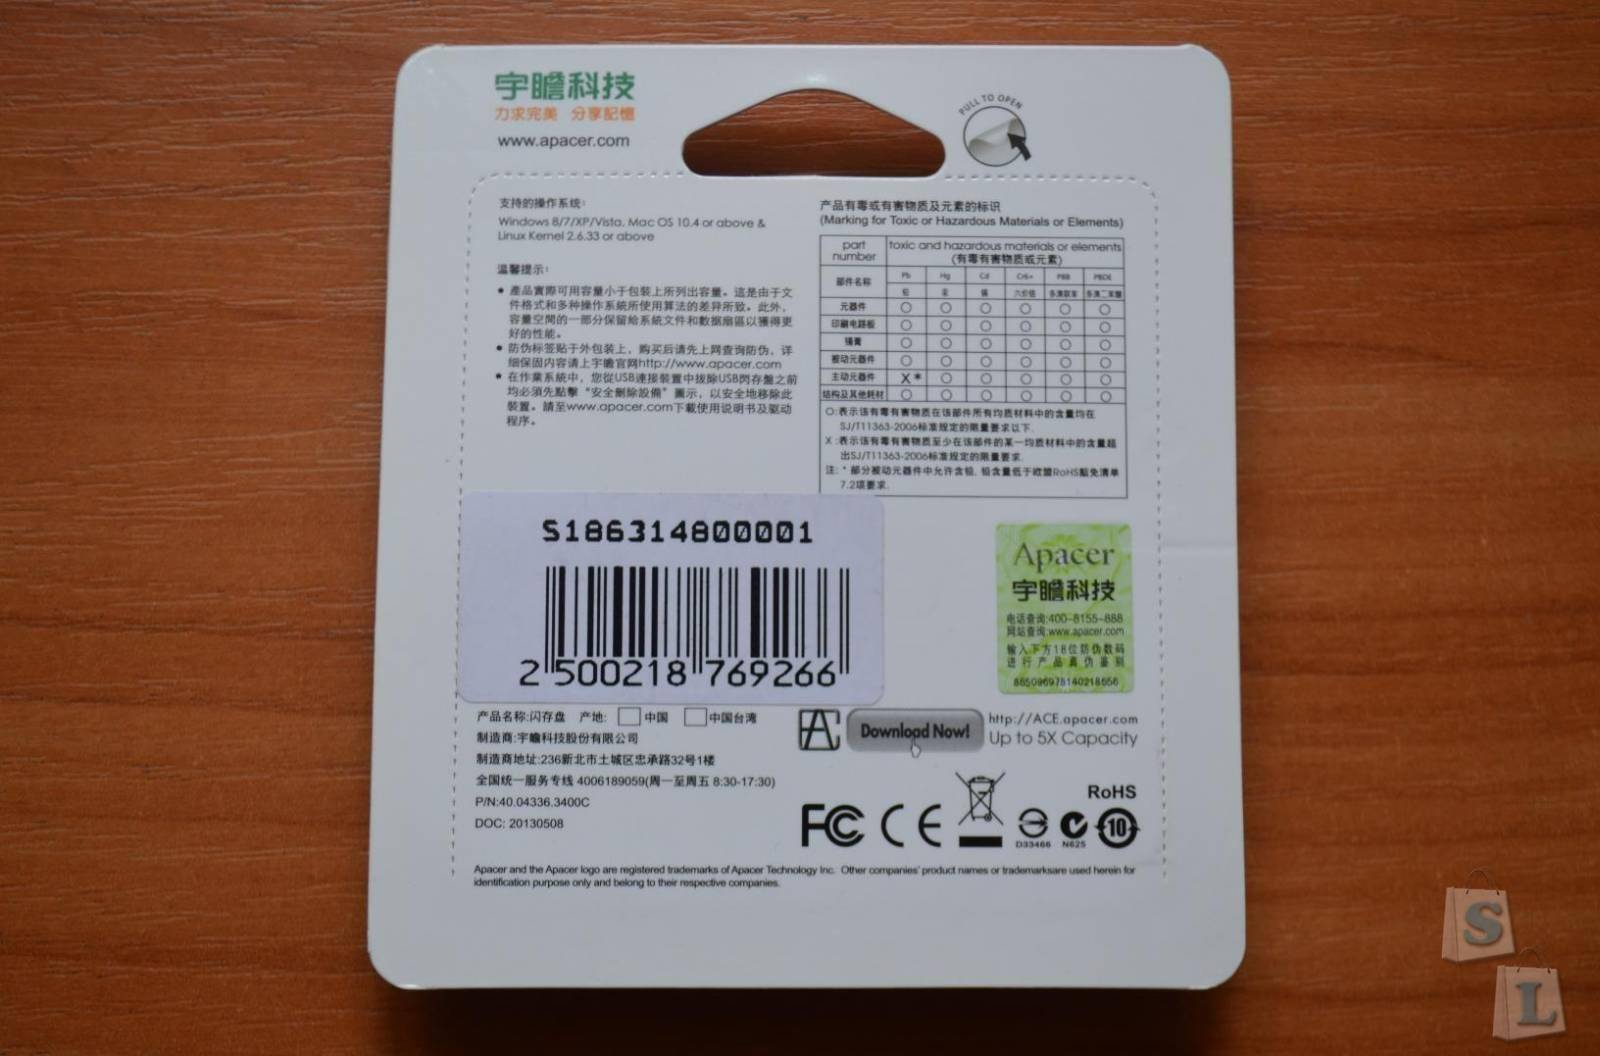 Miniinthebox: Оригинальная дешевая флешка Apacer 16 GB